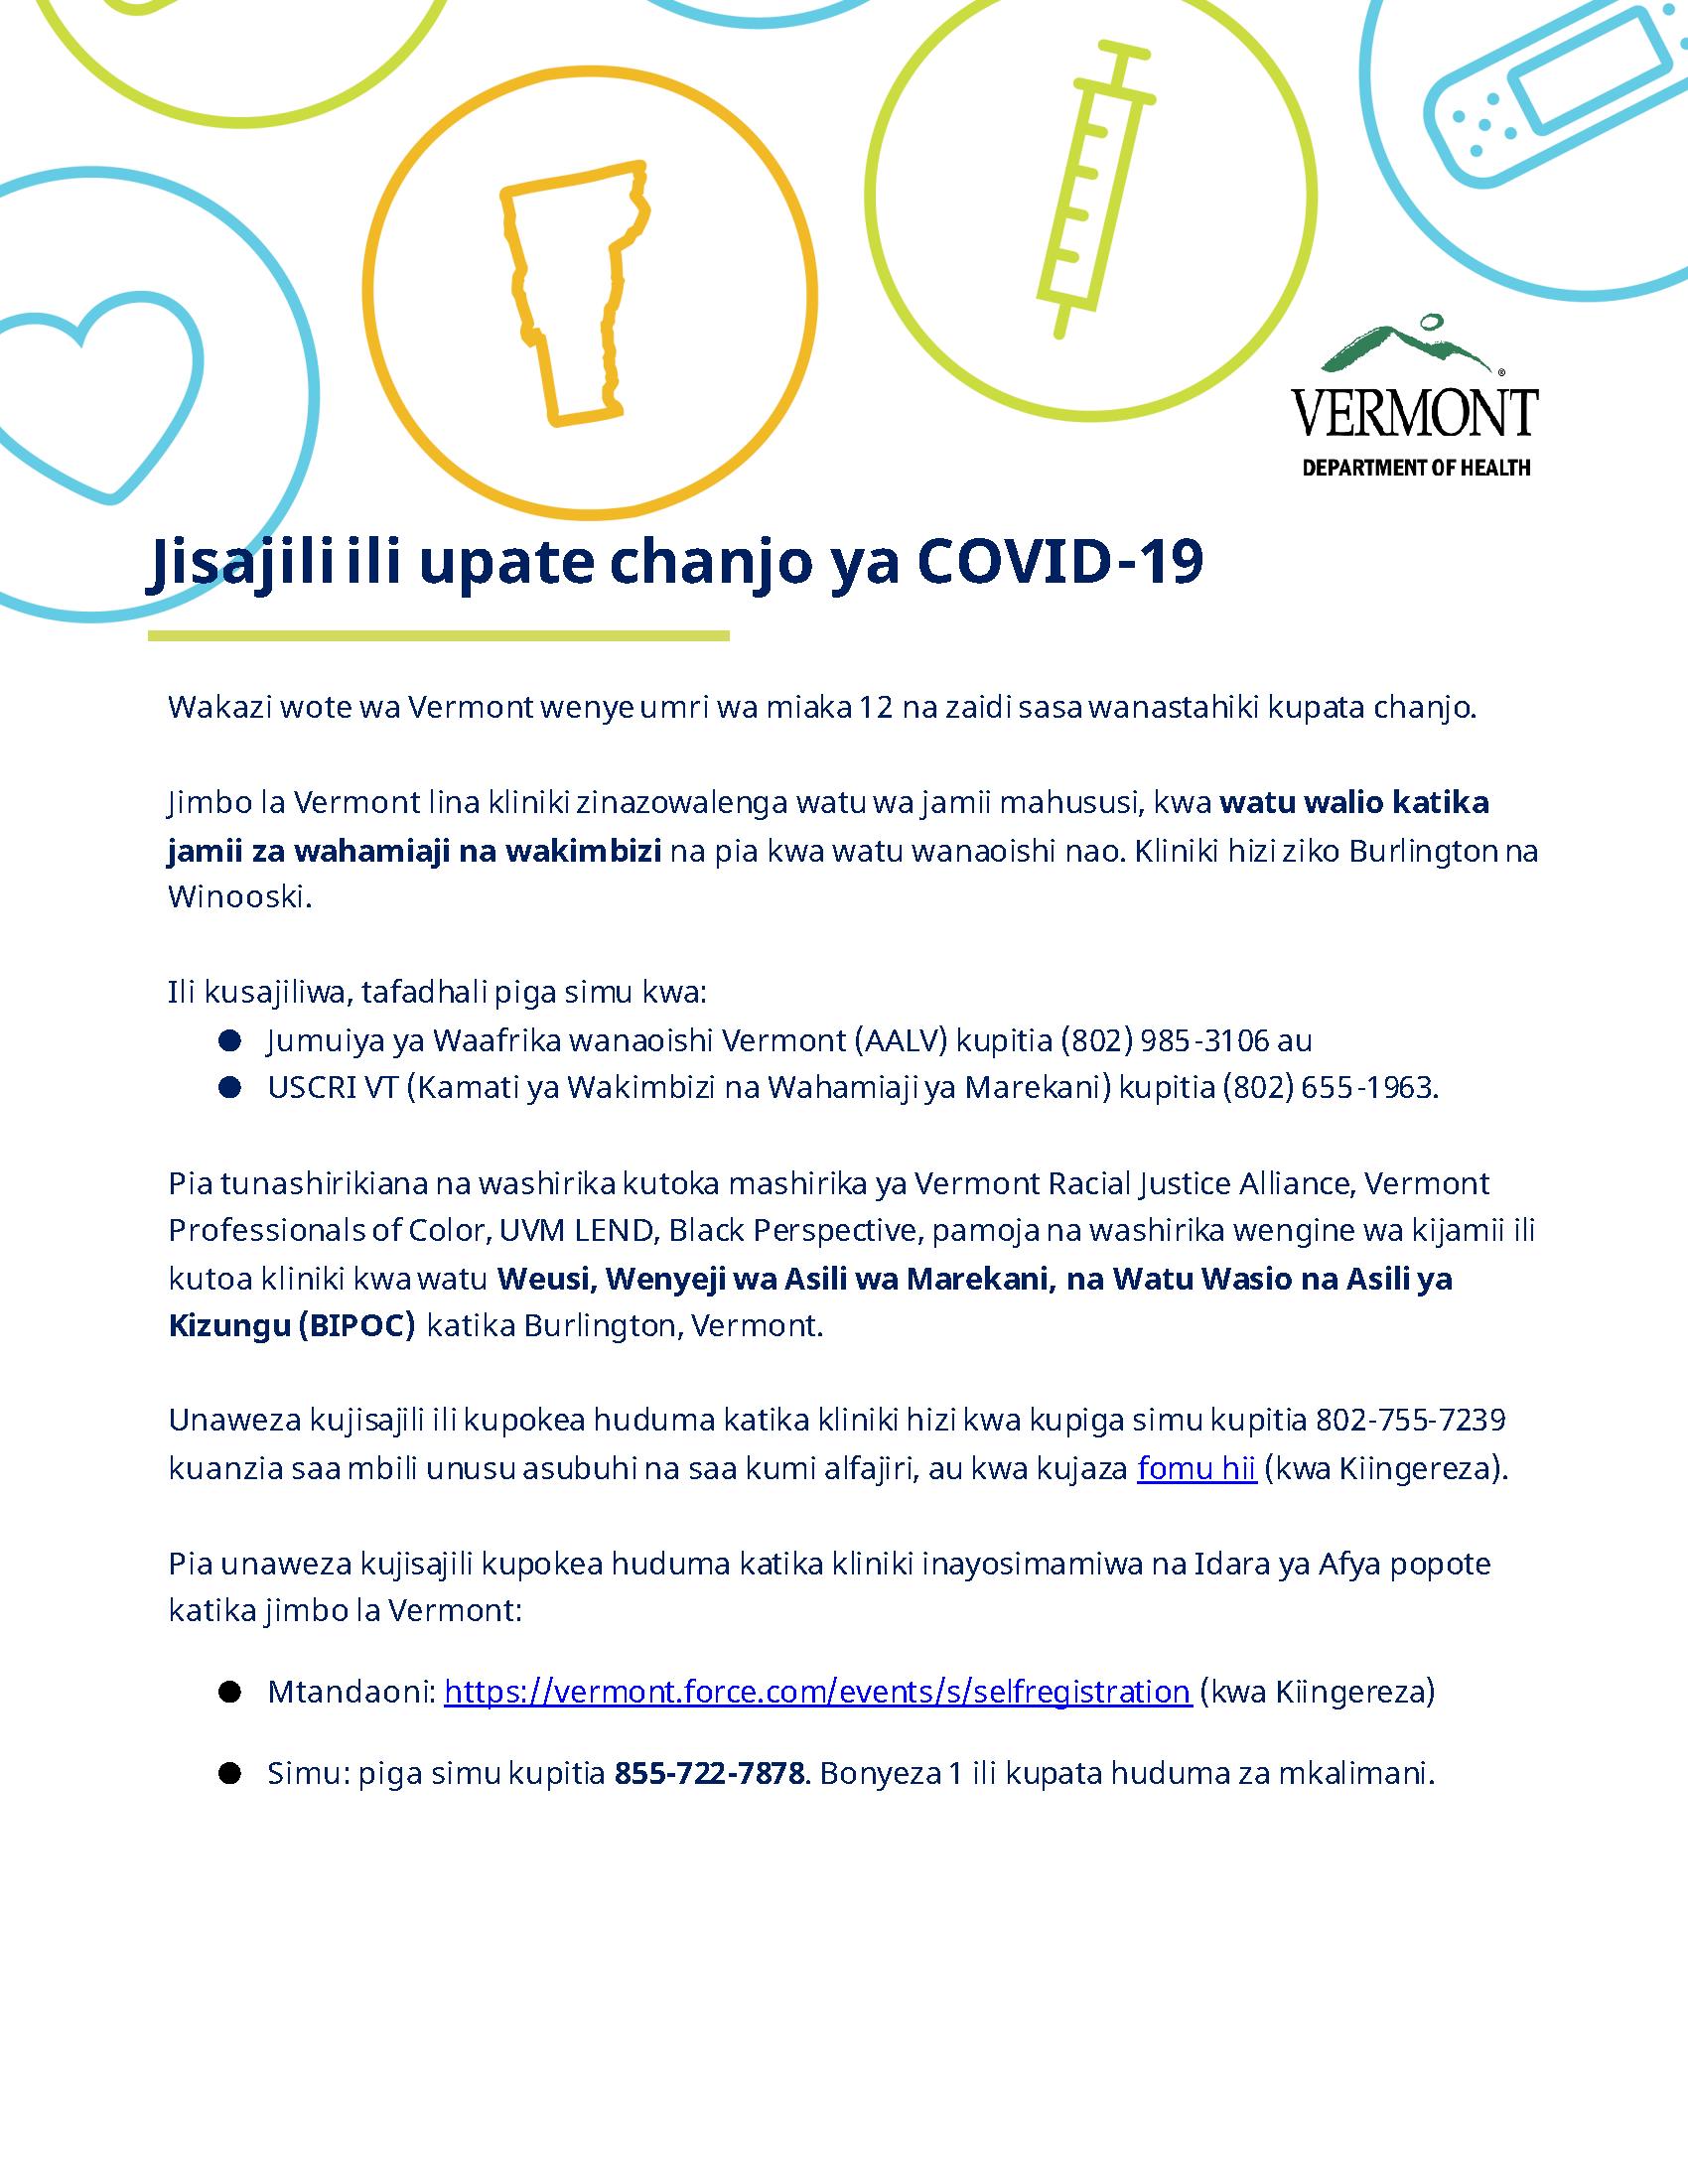 vaccine registration info - Swahili